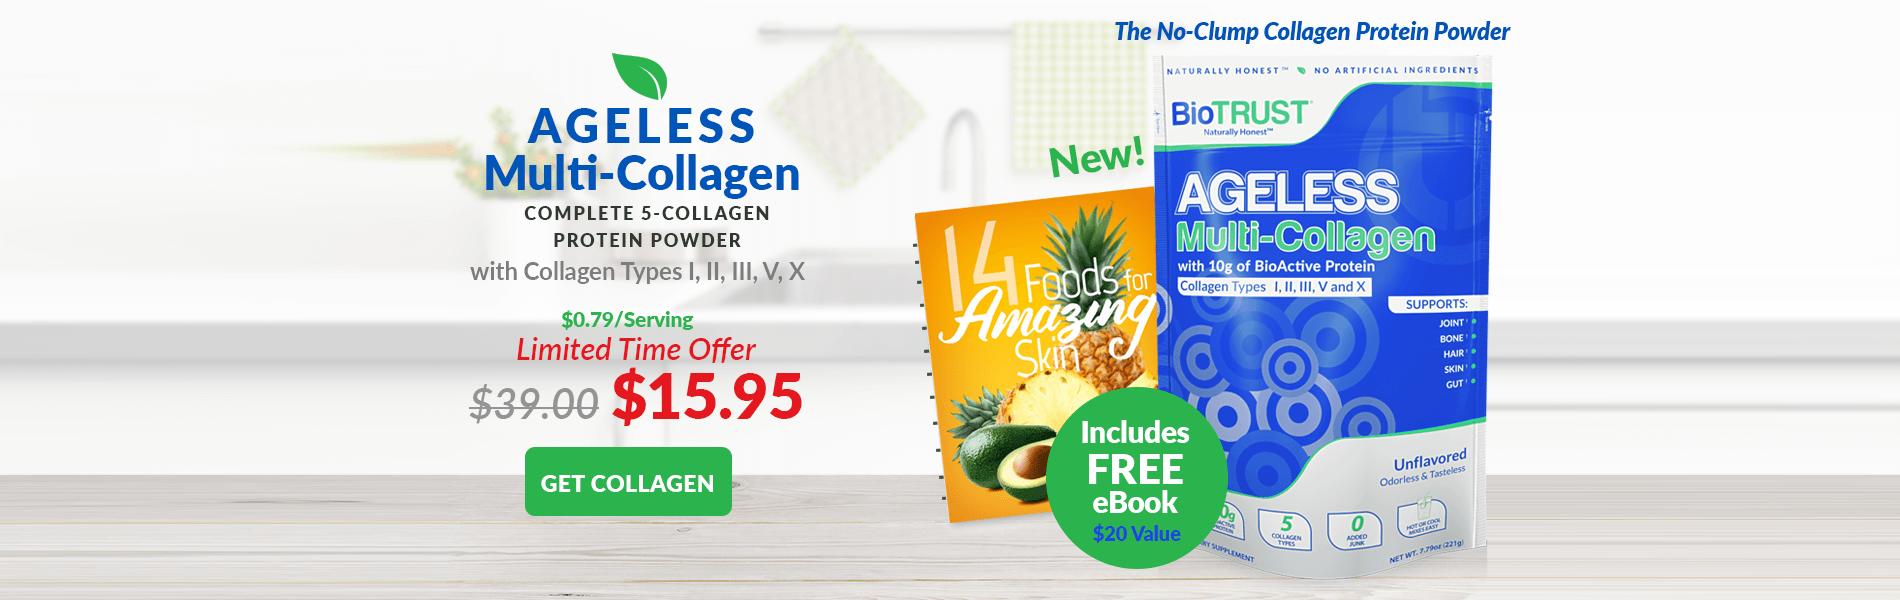 Ageless Mulit-Collagen $15.95